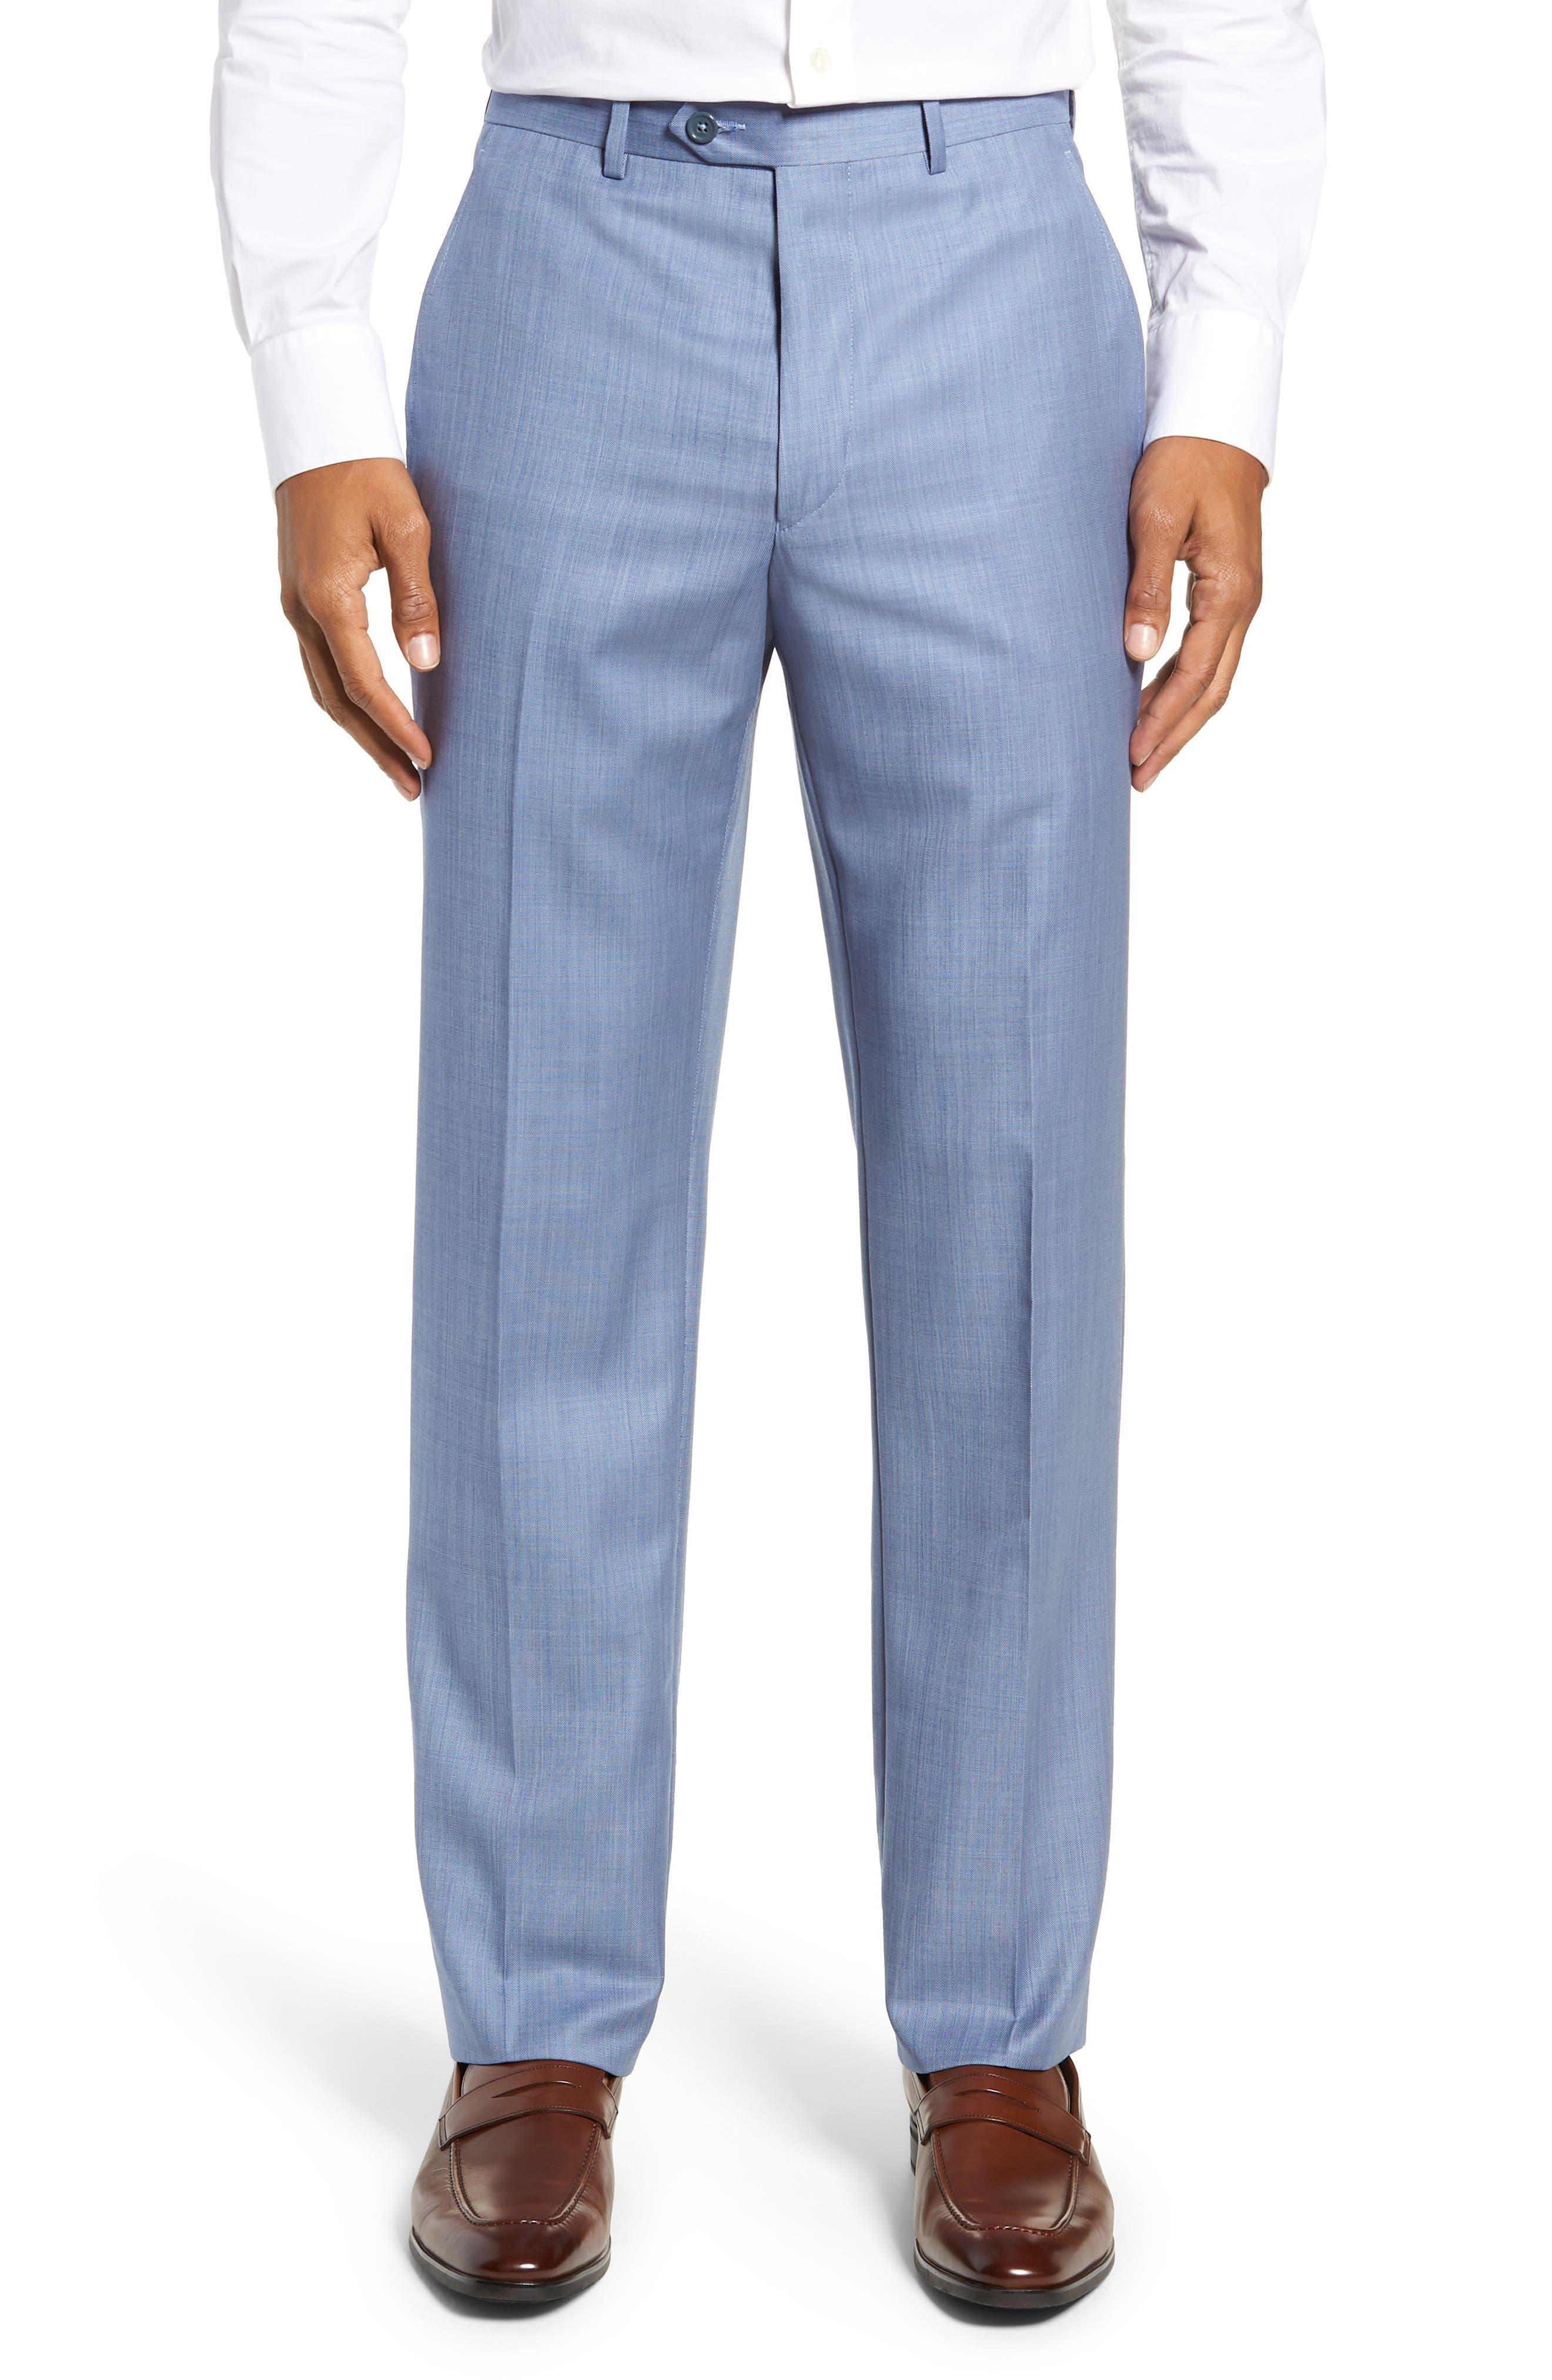 Flat Front Sharkskin Wool Trousers,                             Main thumbnail 1, color,                             LIGHT BLUE